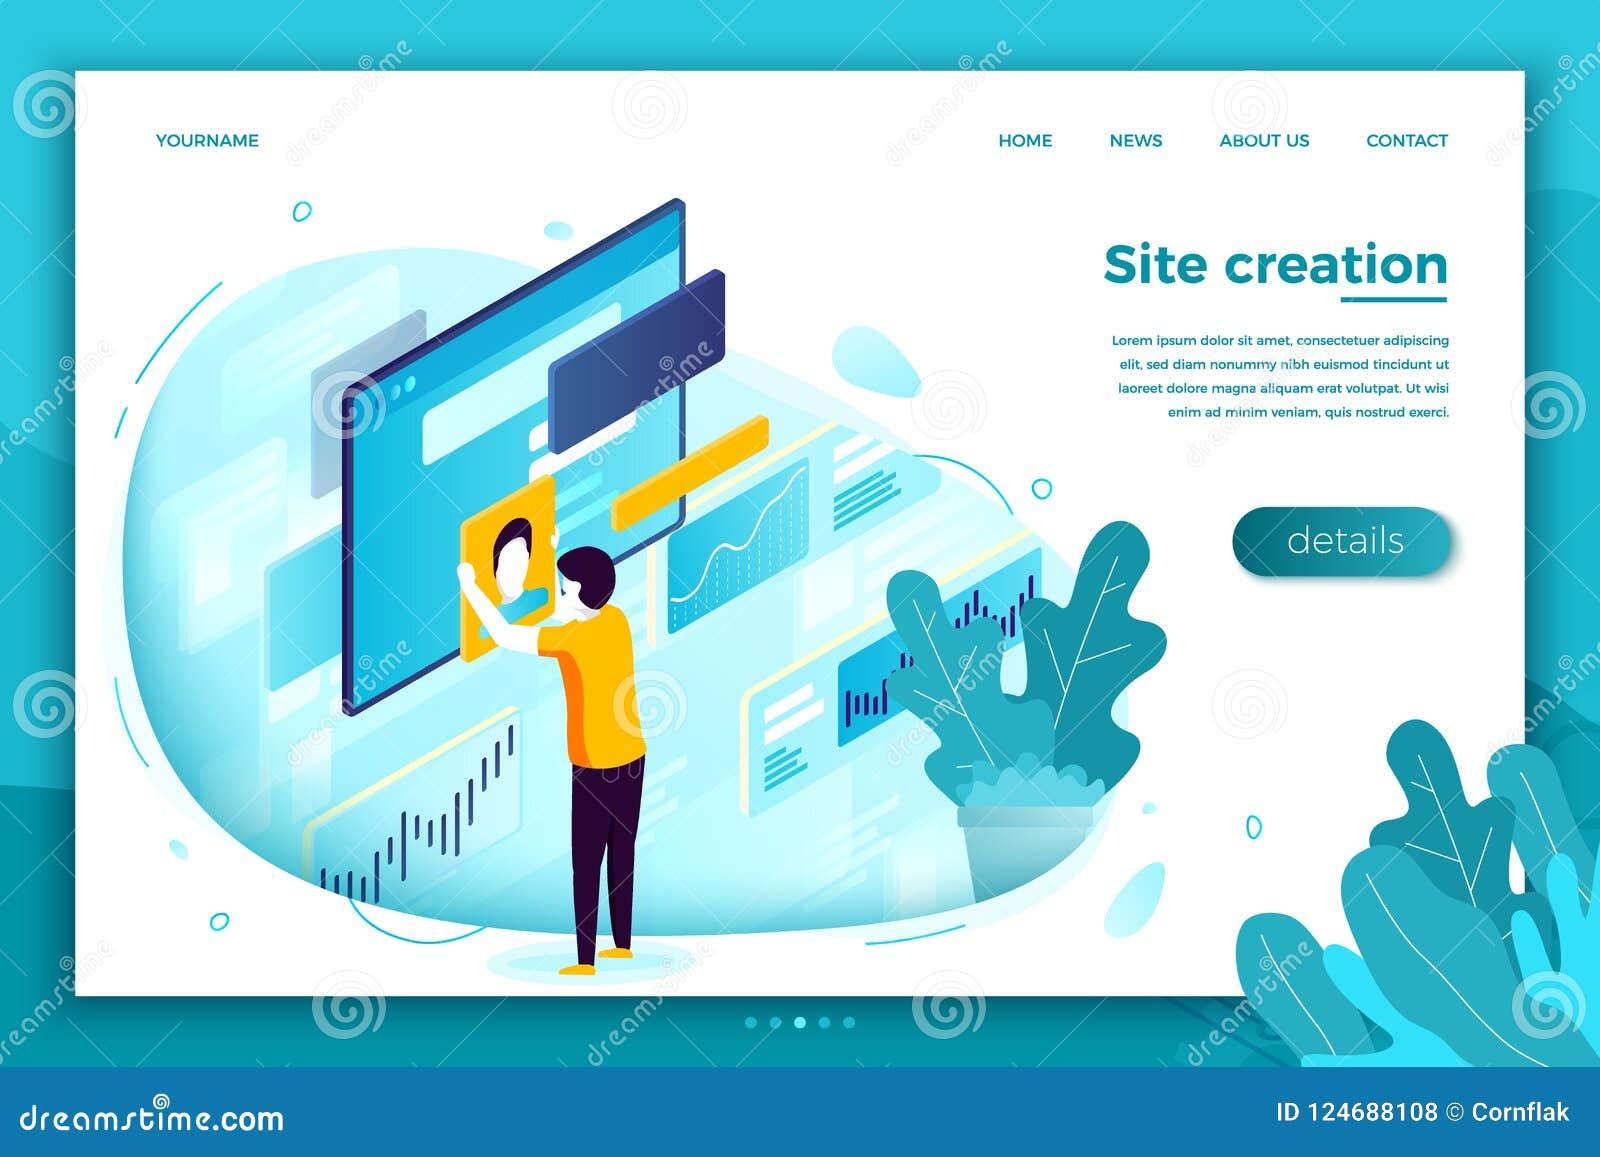 Vector concept illustration, site creation process